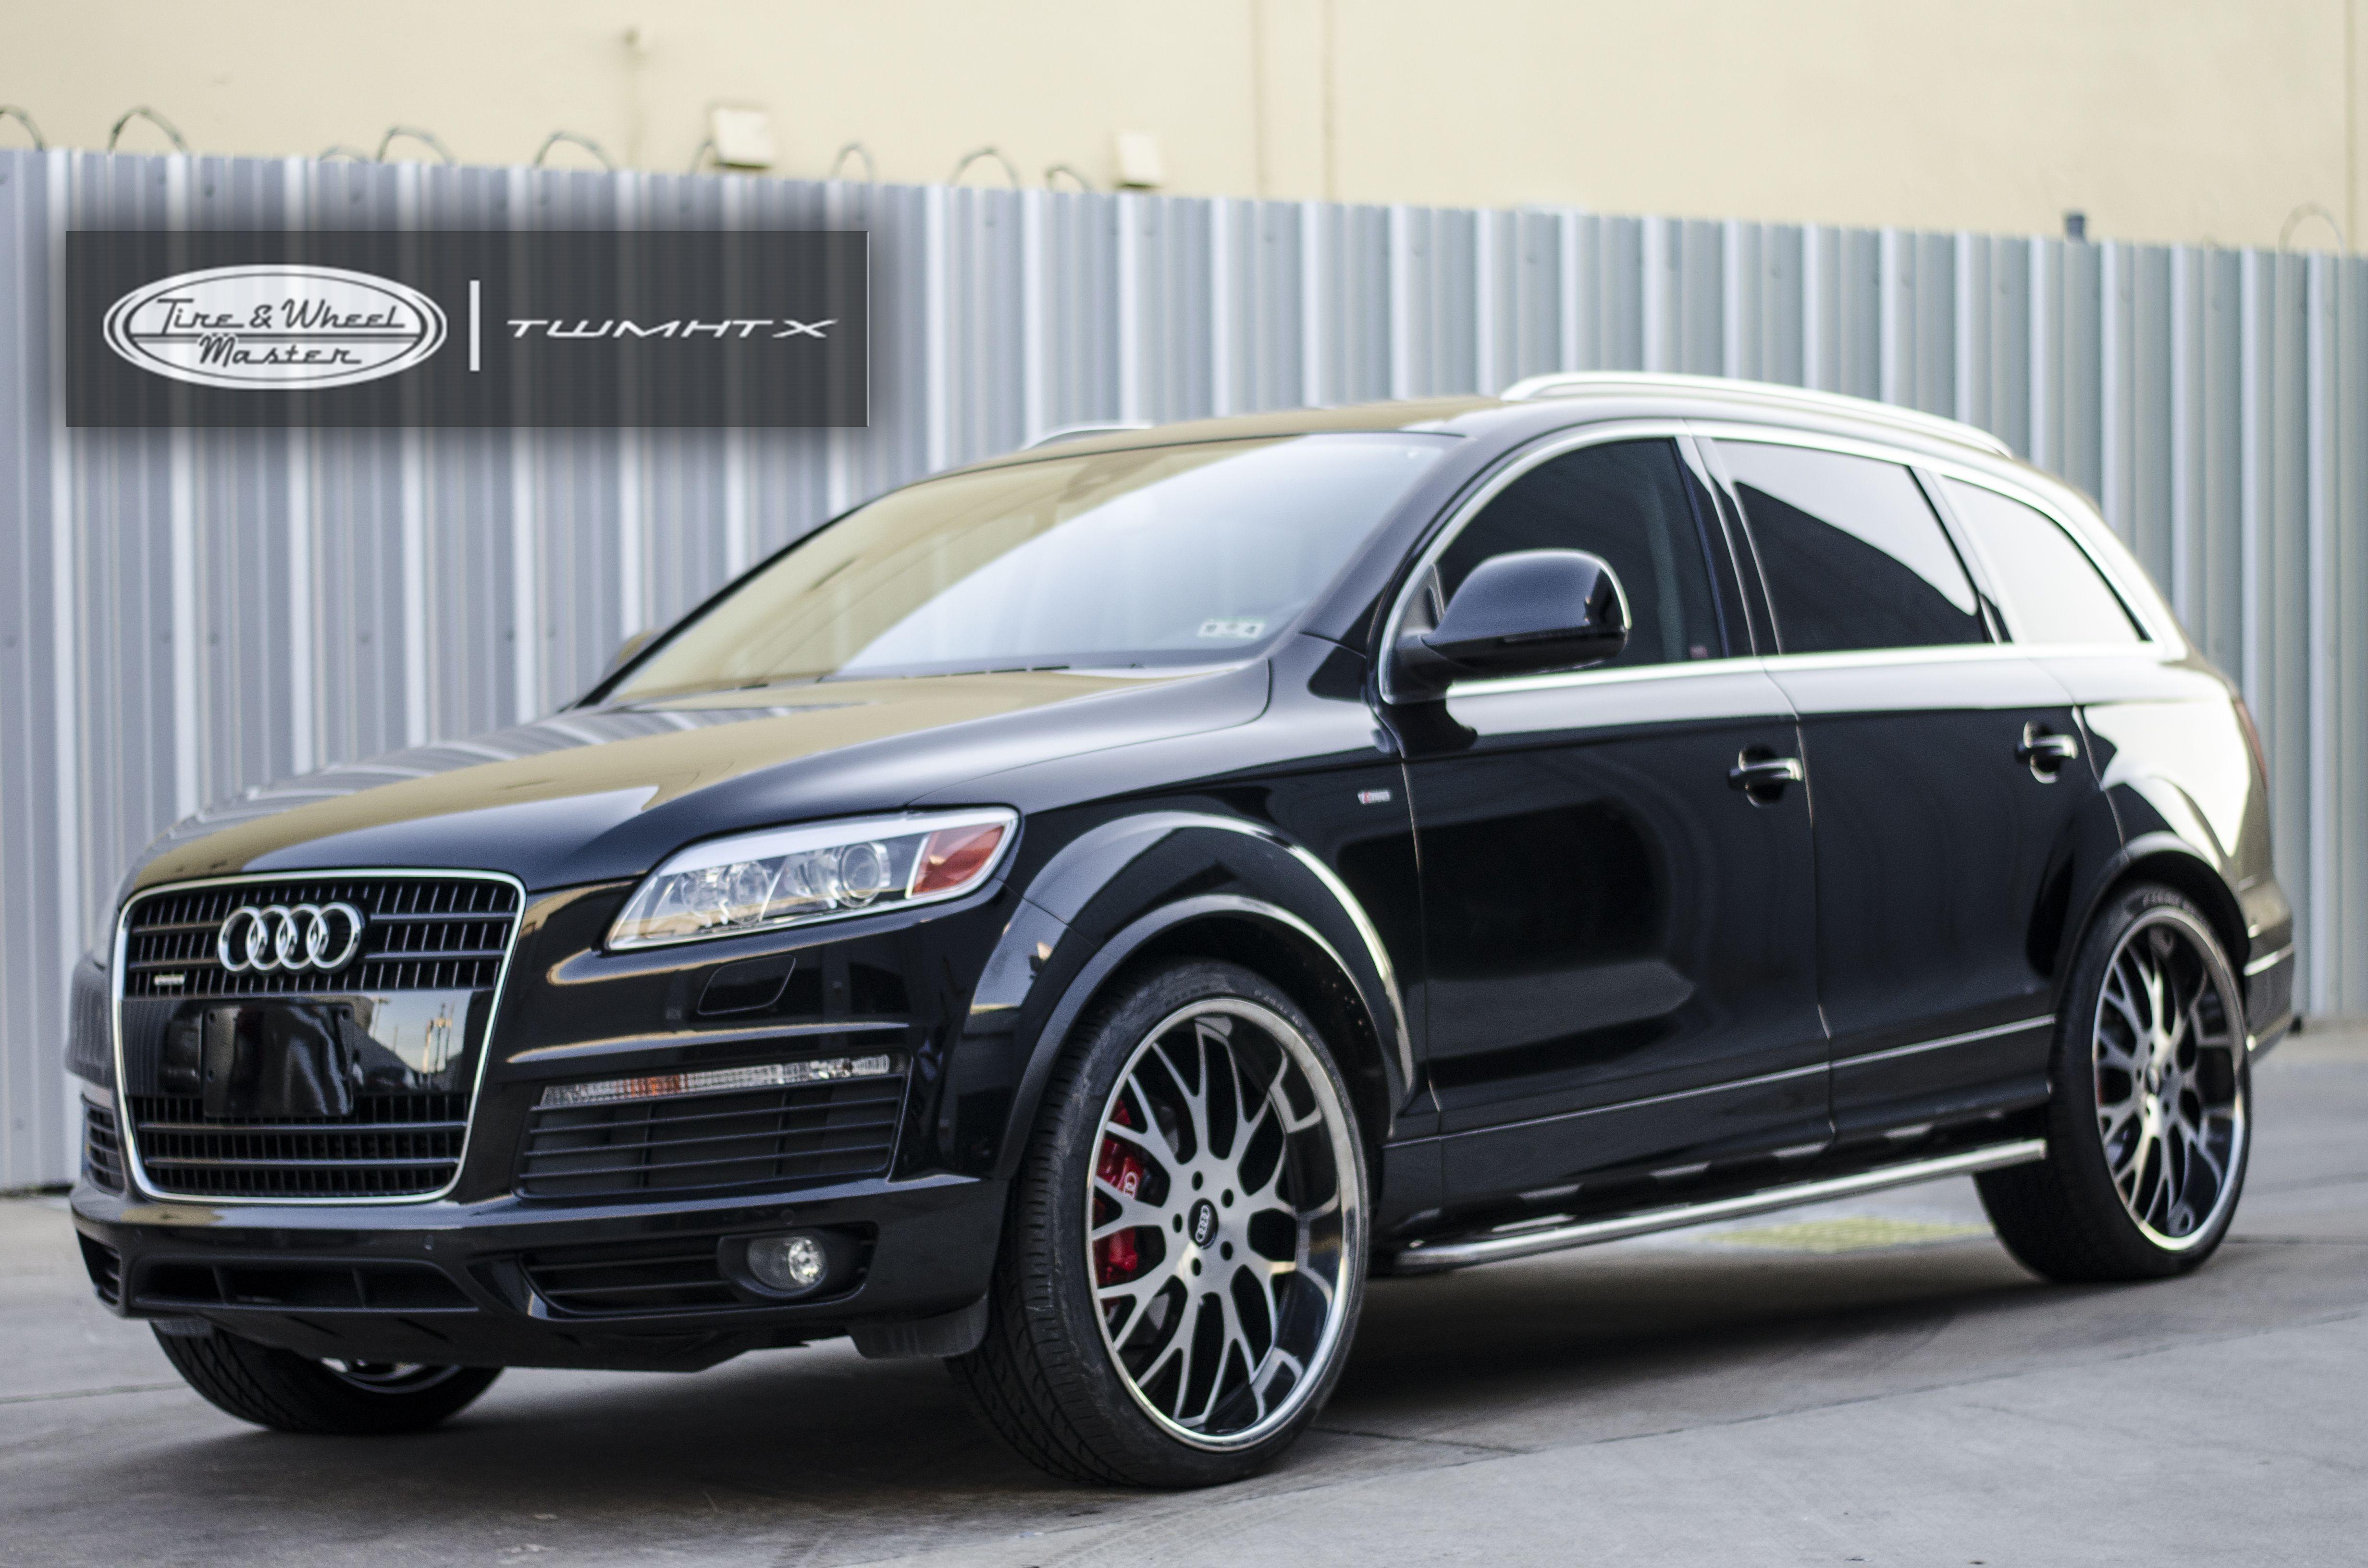 Black Audi Q7 With Custom Wheels Car Wheels Rims Car Wheels Custom Wheels